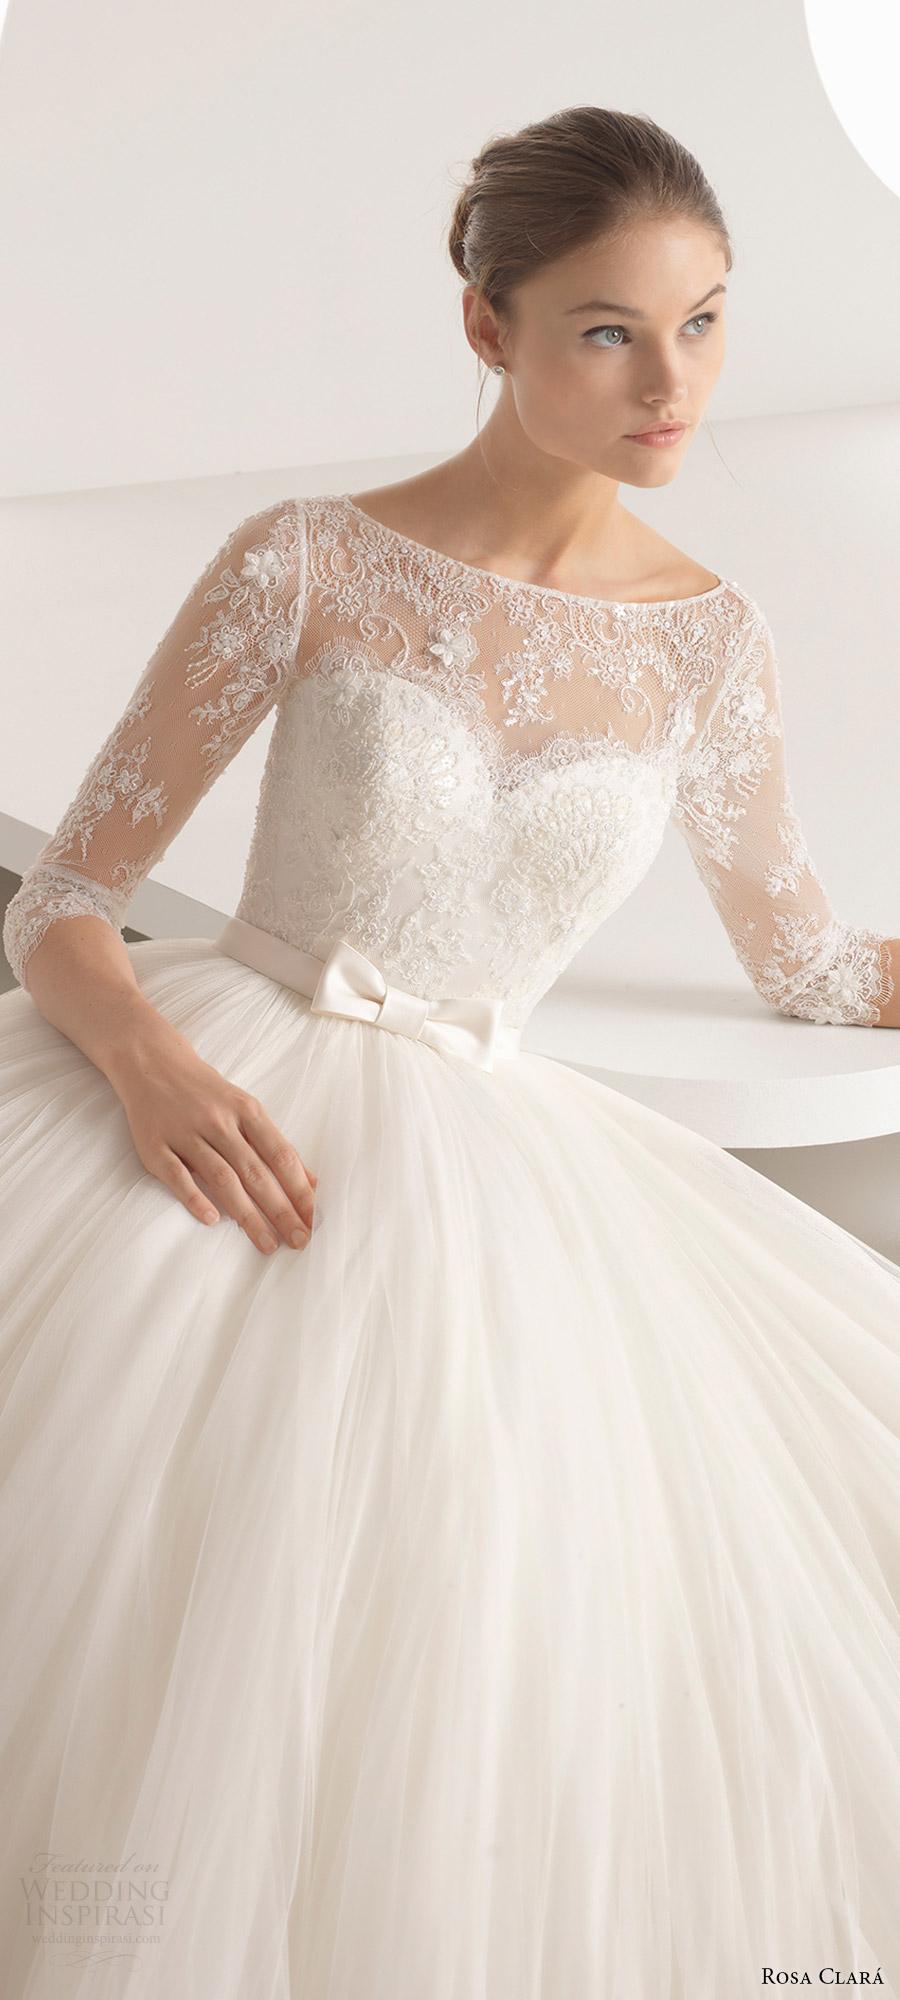 rosa clara 2018 bridal trends 3 quarter illusion sleeves bateau neck lace bodice ball gown wedding dress (alina) zv romantic princess